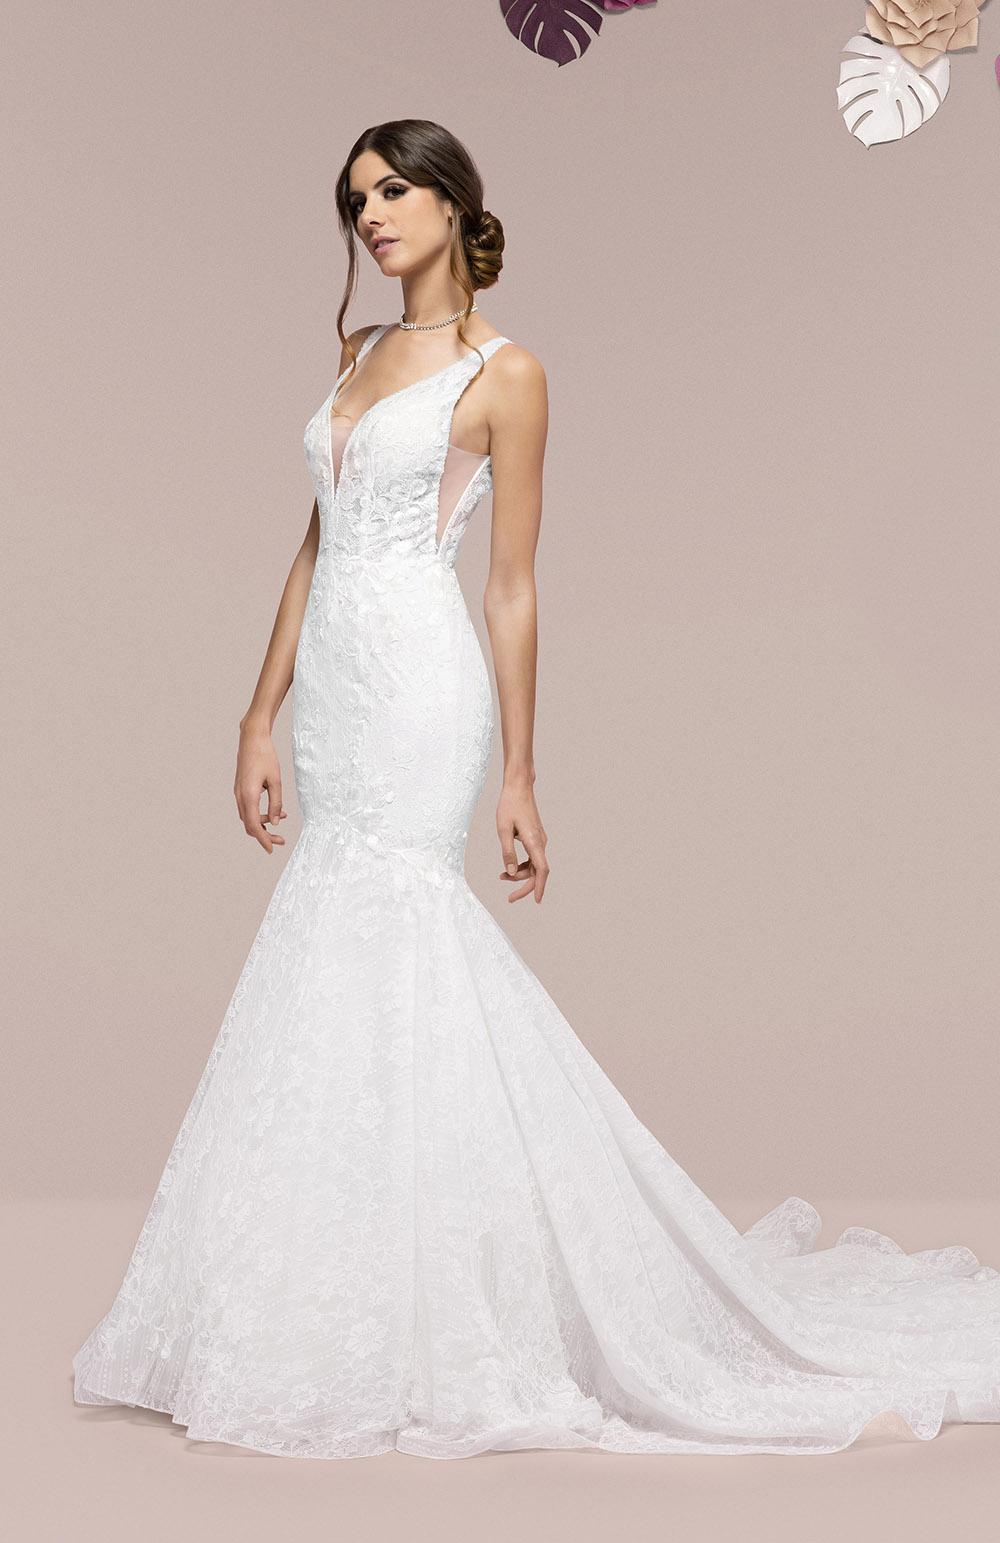 Robe de mariée Modèle Vanna